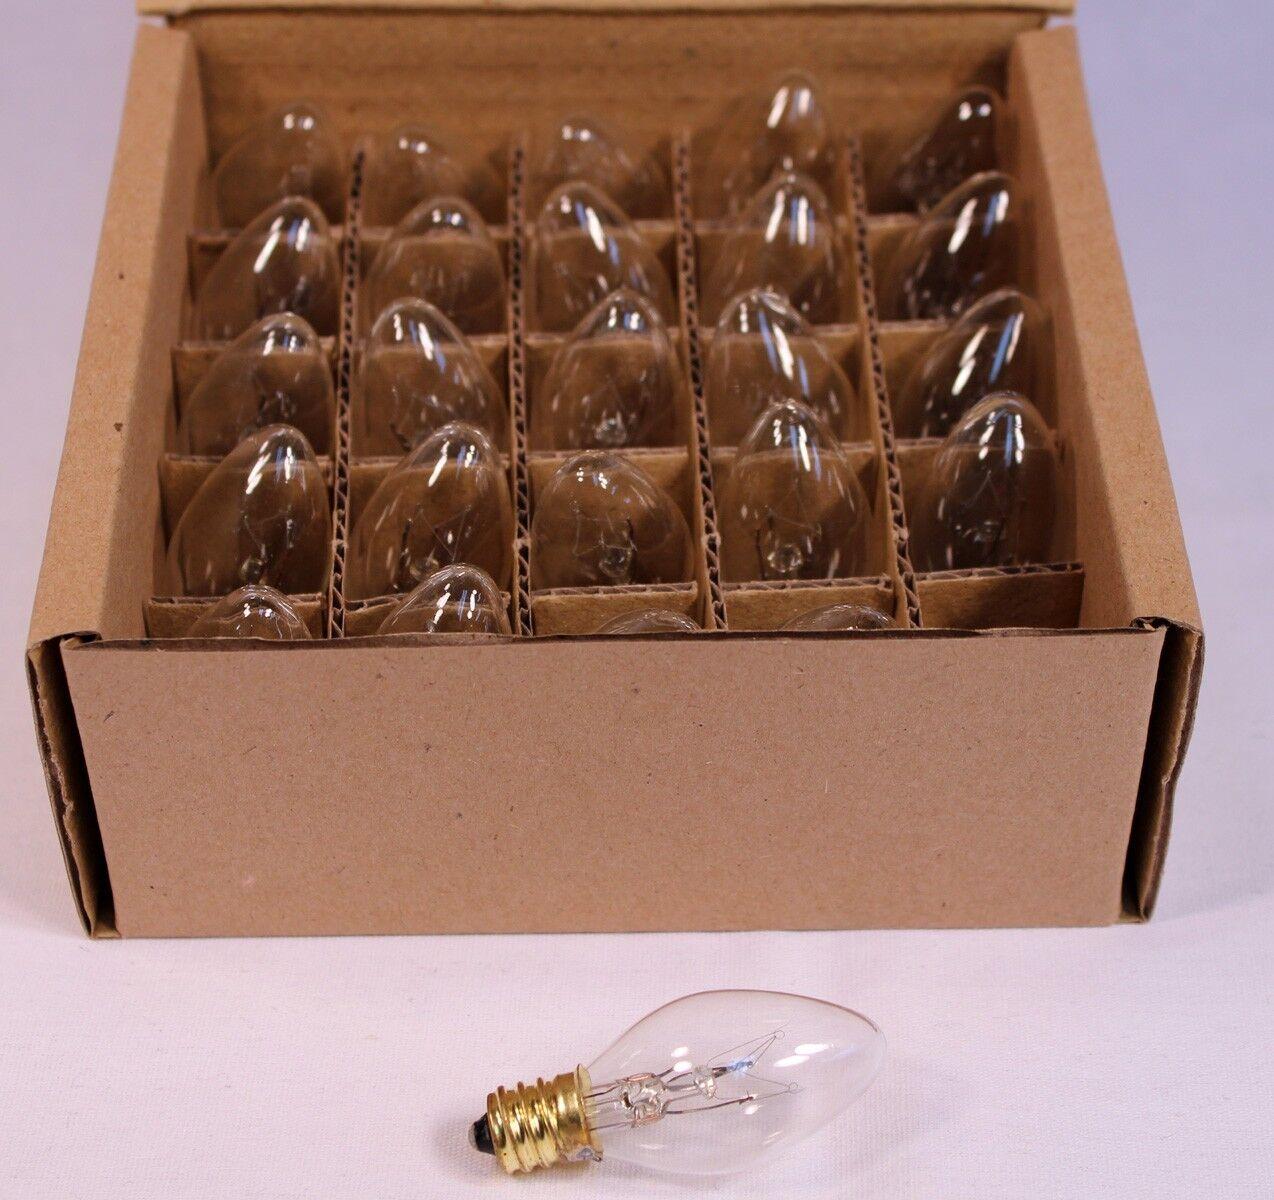 Clear Twinkle Blinking Light Bulbs – C-7 ,Candelabra Base, 7 Watt – Box of 25 Home & Garden